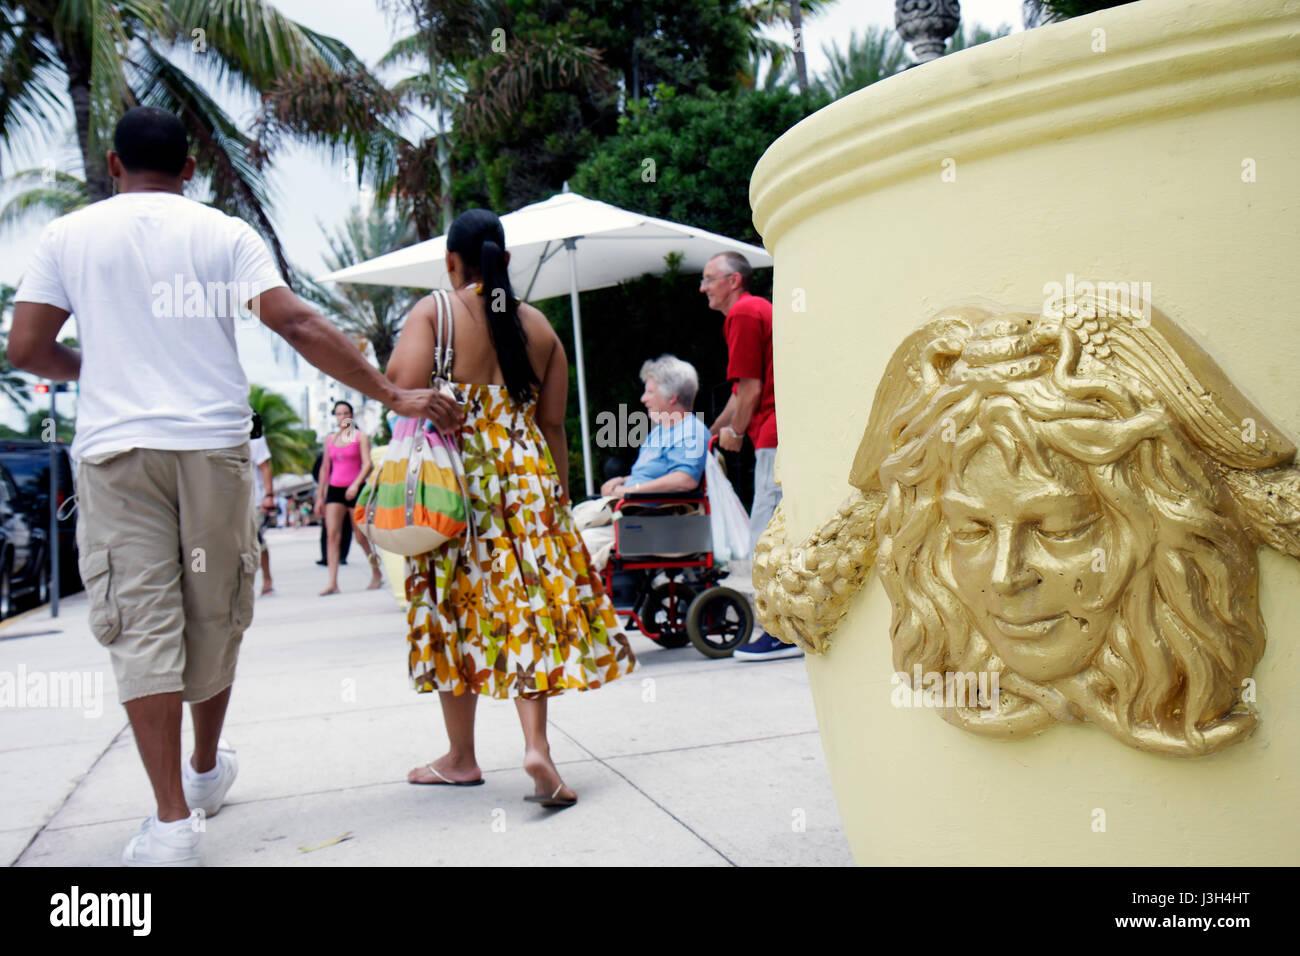 Miami Beach Florida Ocean Drive Casa Casuarina entrance Hispanic man woman couple ornamental planter sidewalk walking - Stock Image